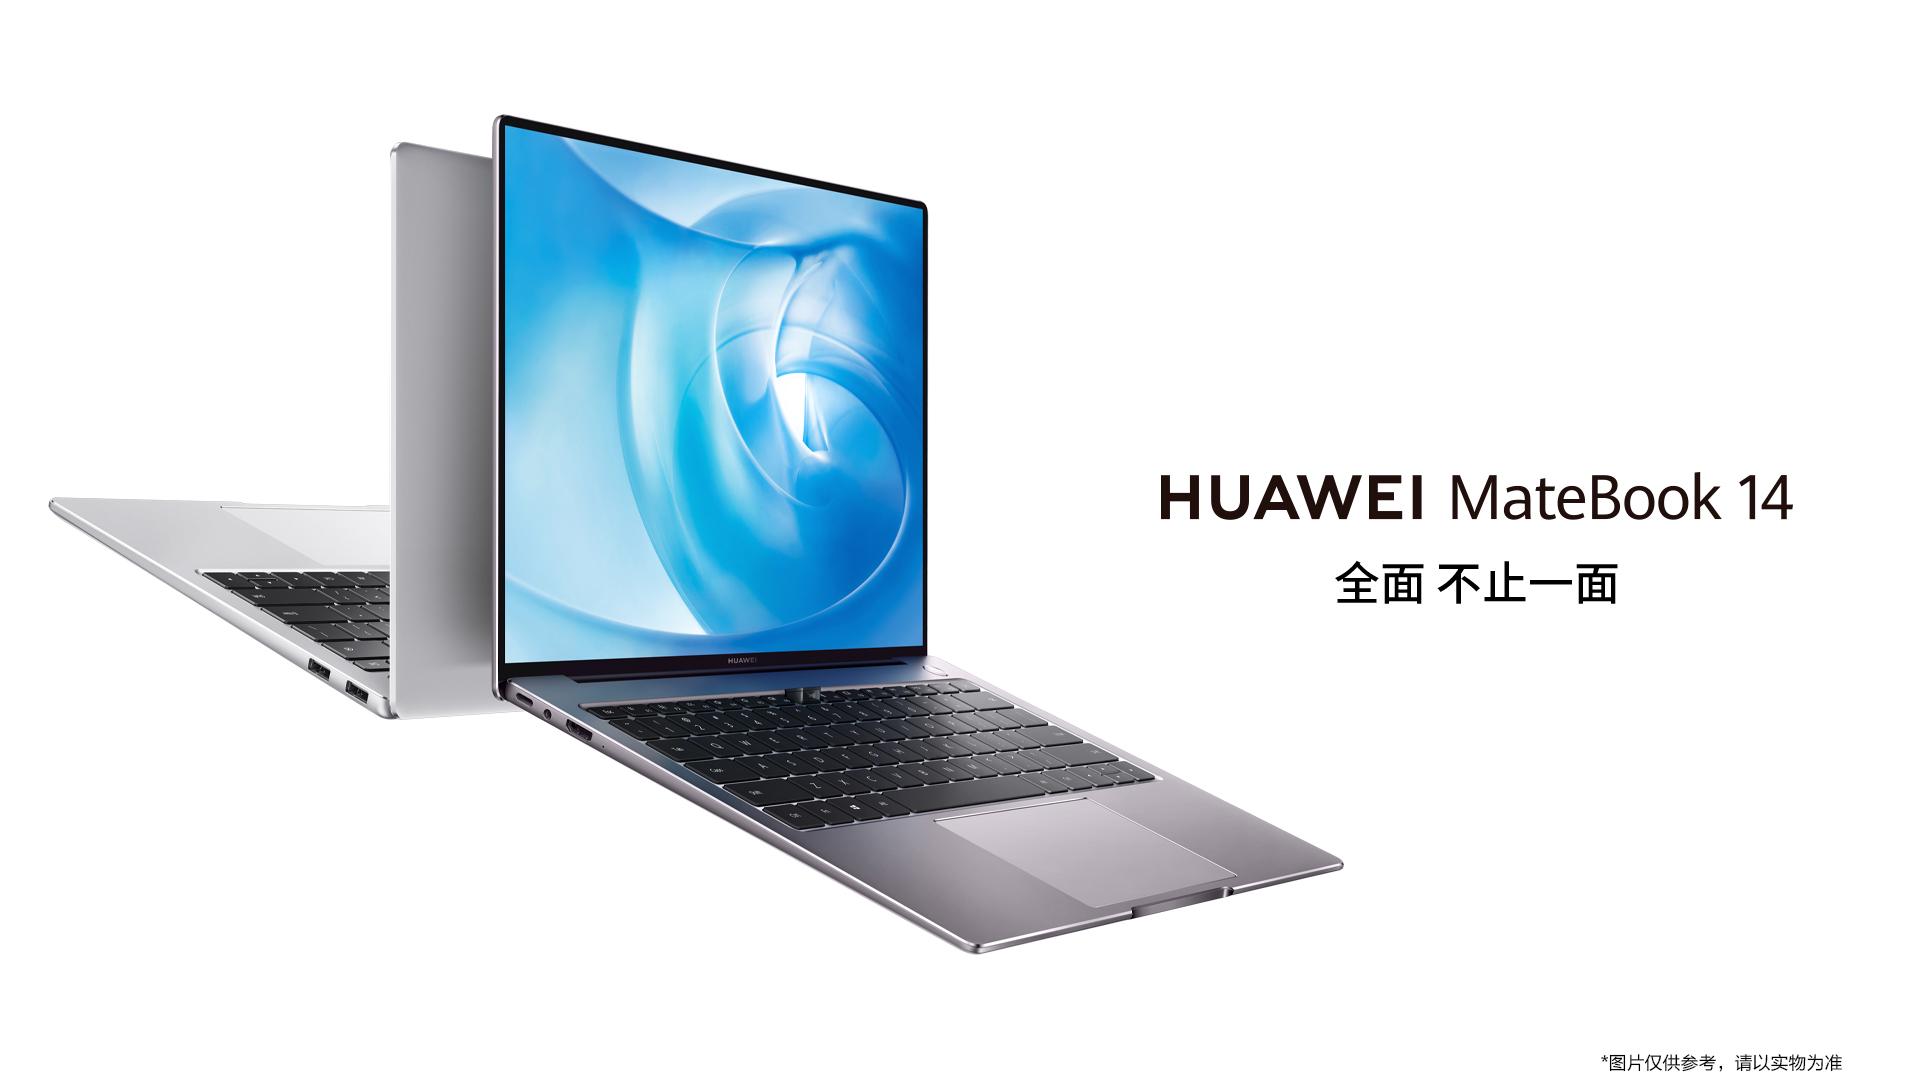 Huawei/华为 MateBook 14 KLVL-WFH9 2021款  i5-1135G7 16GB